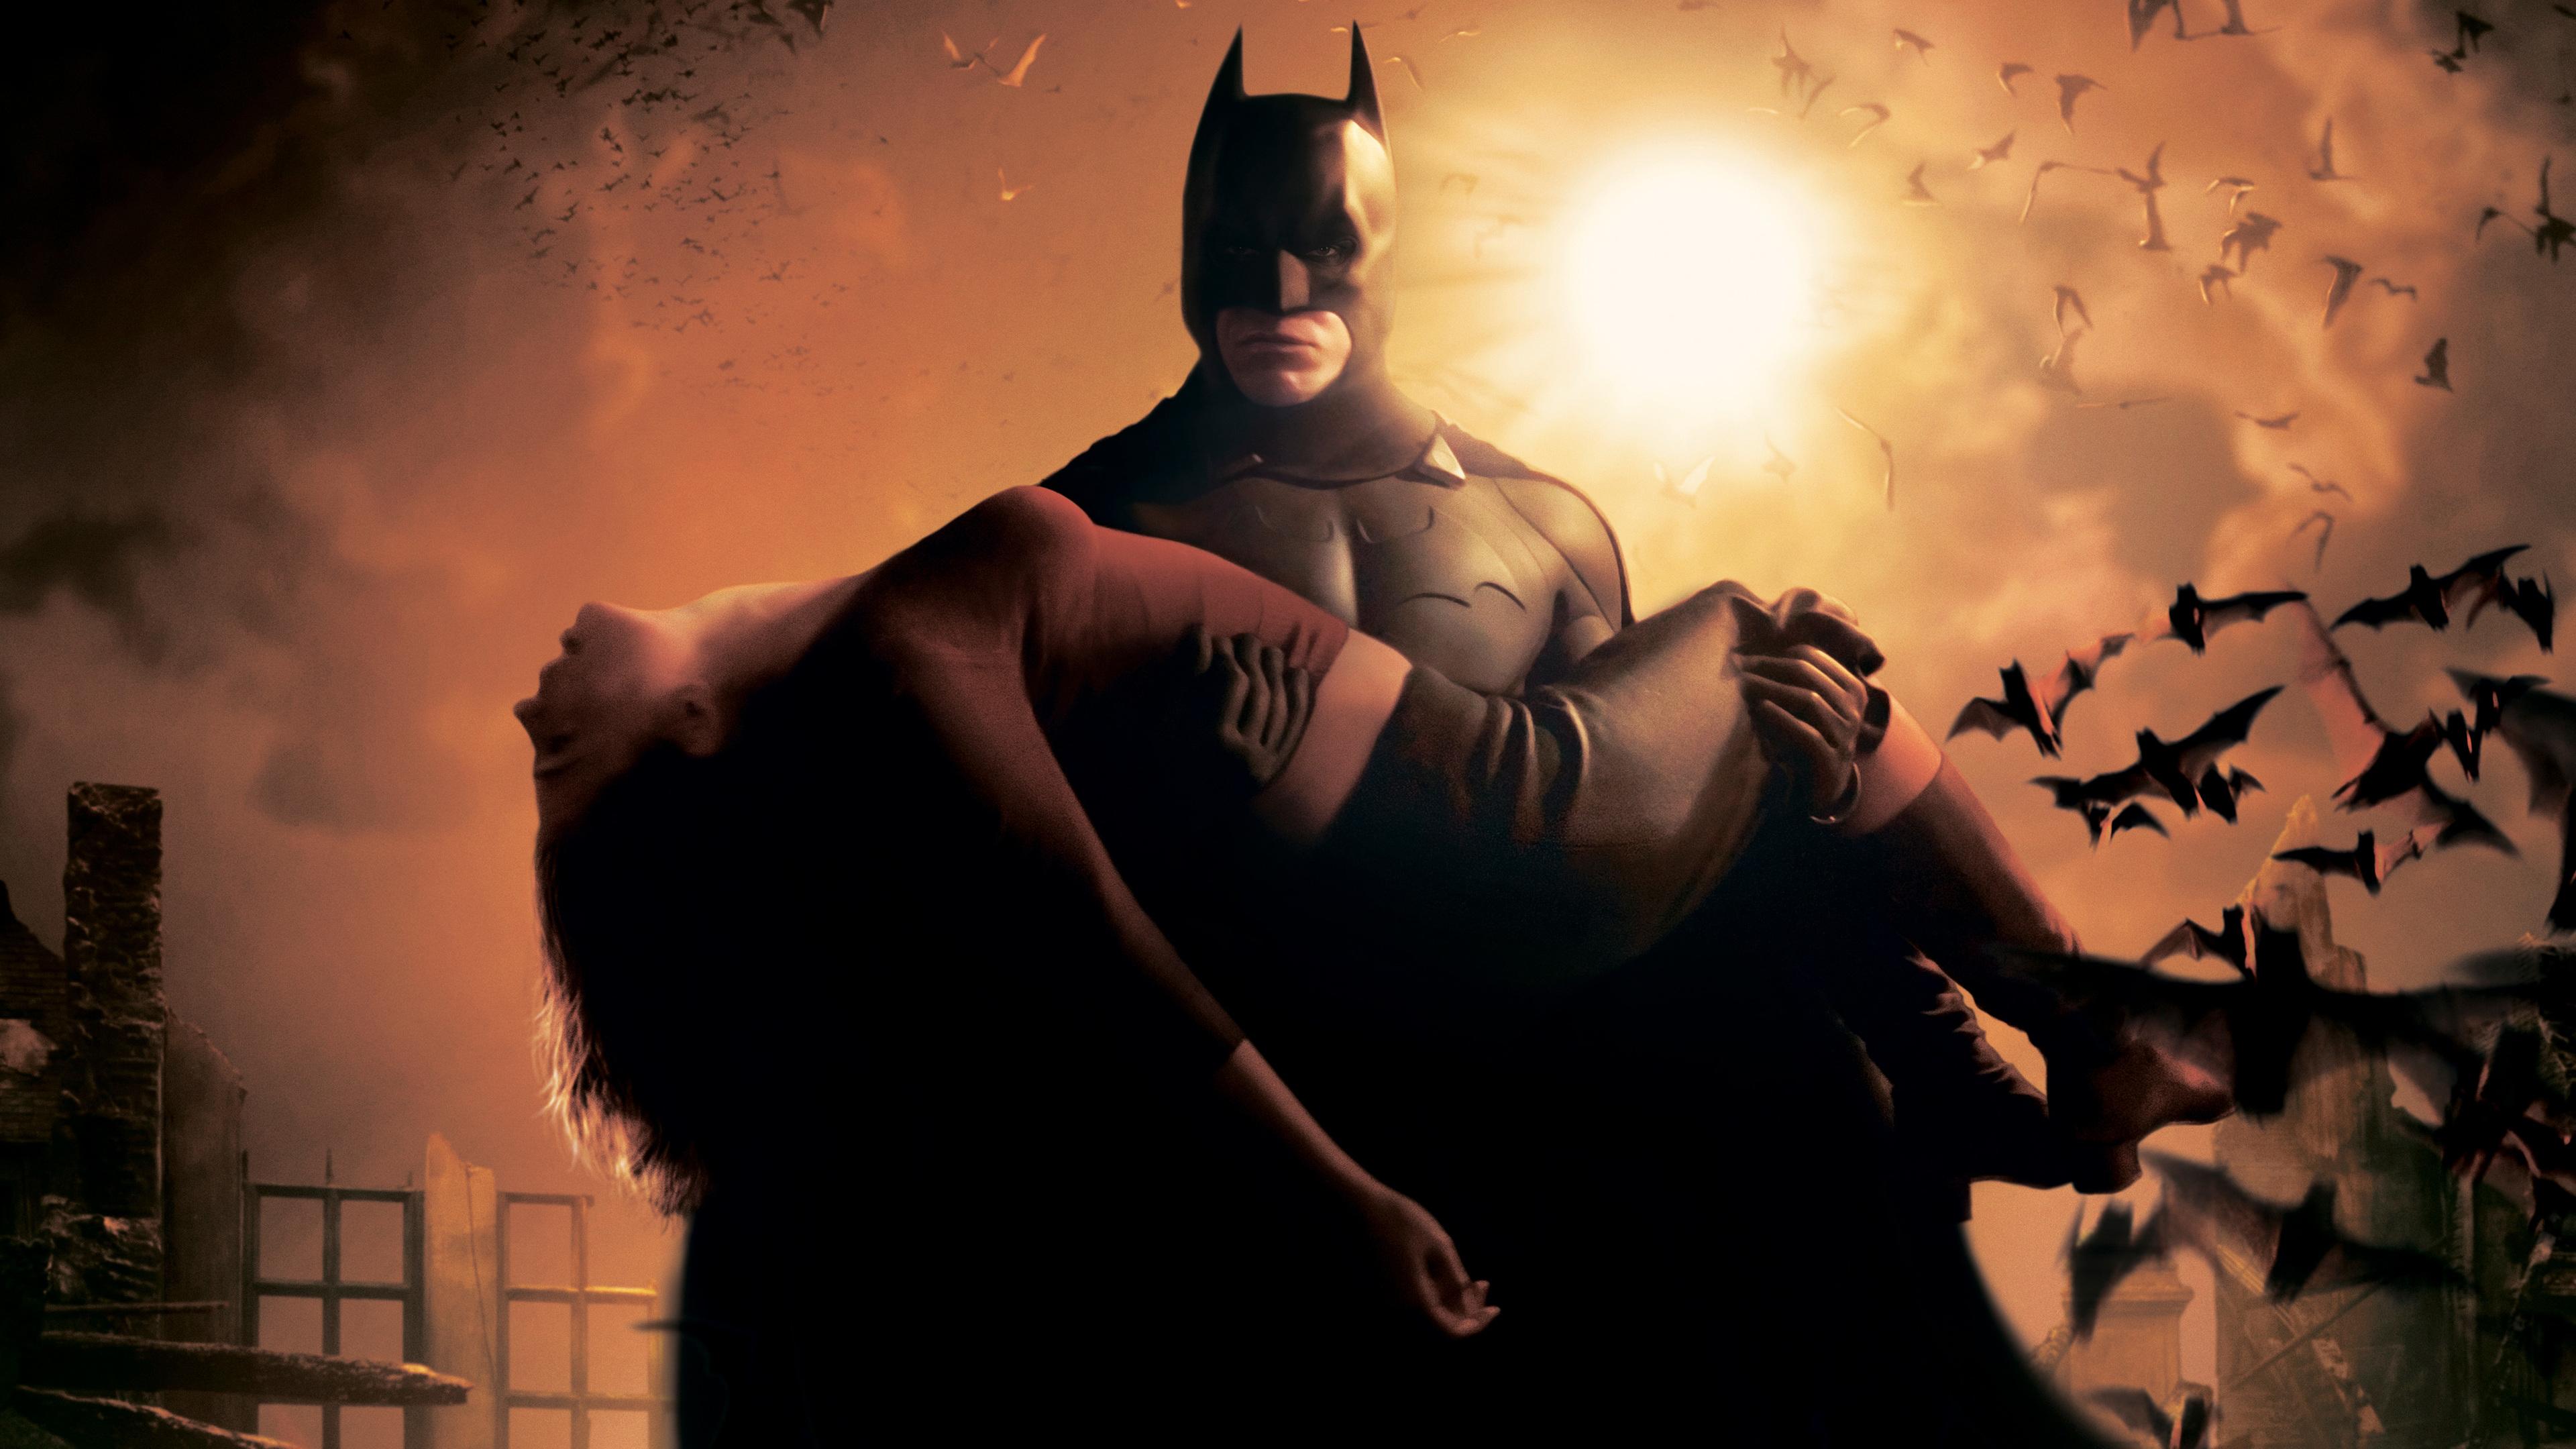 katie holmes batman begins poster 4k 1553070992 - Katie Holmes Batman Begins Poster 4k - superheroes wallpapers, hd-wallpapers, batman wallpapers, 4k-wallpapers